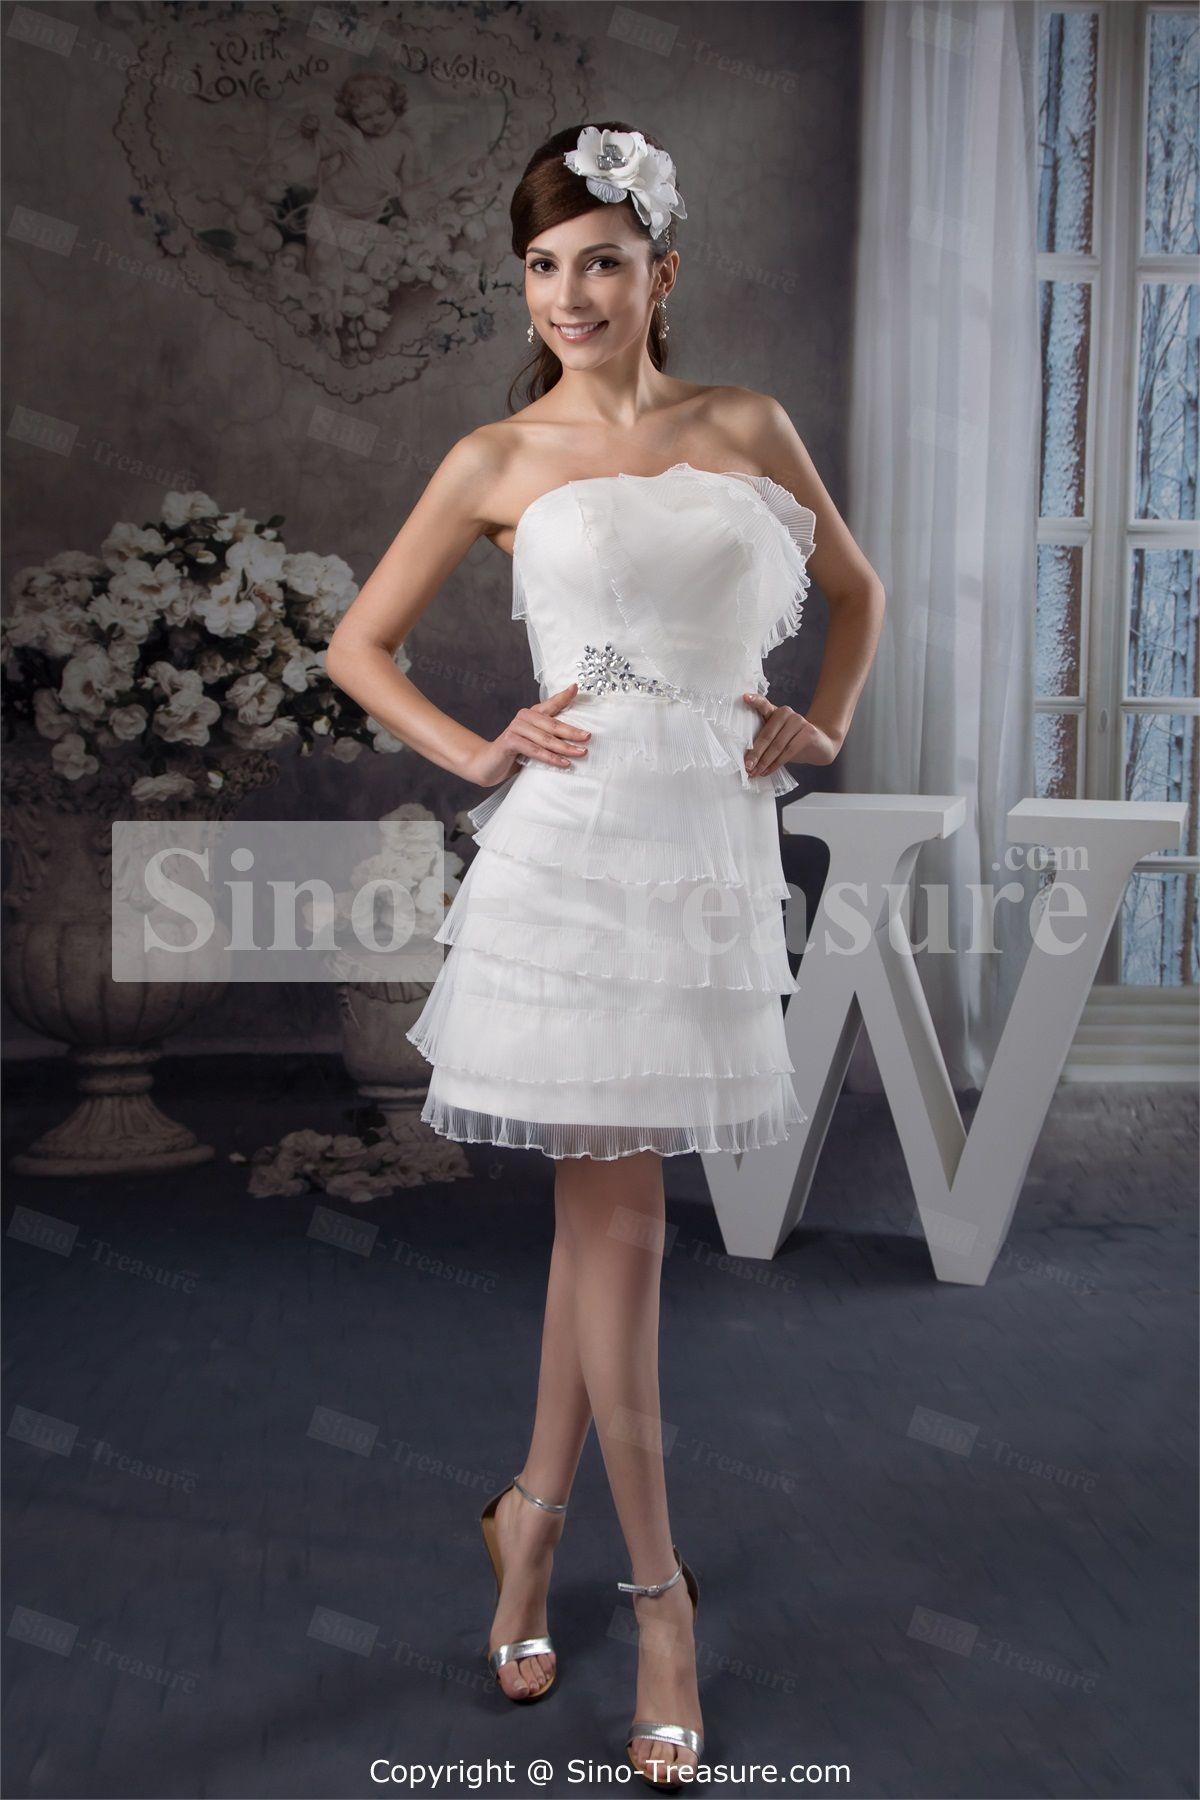 White ALine Short Mini Sleeveless Cocktail DressHomecoming Dress